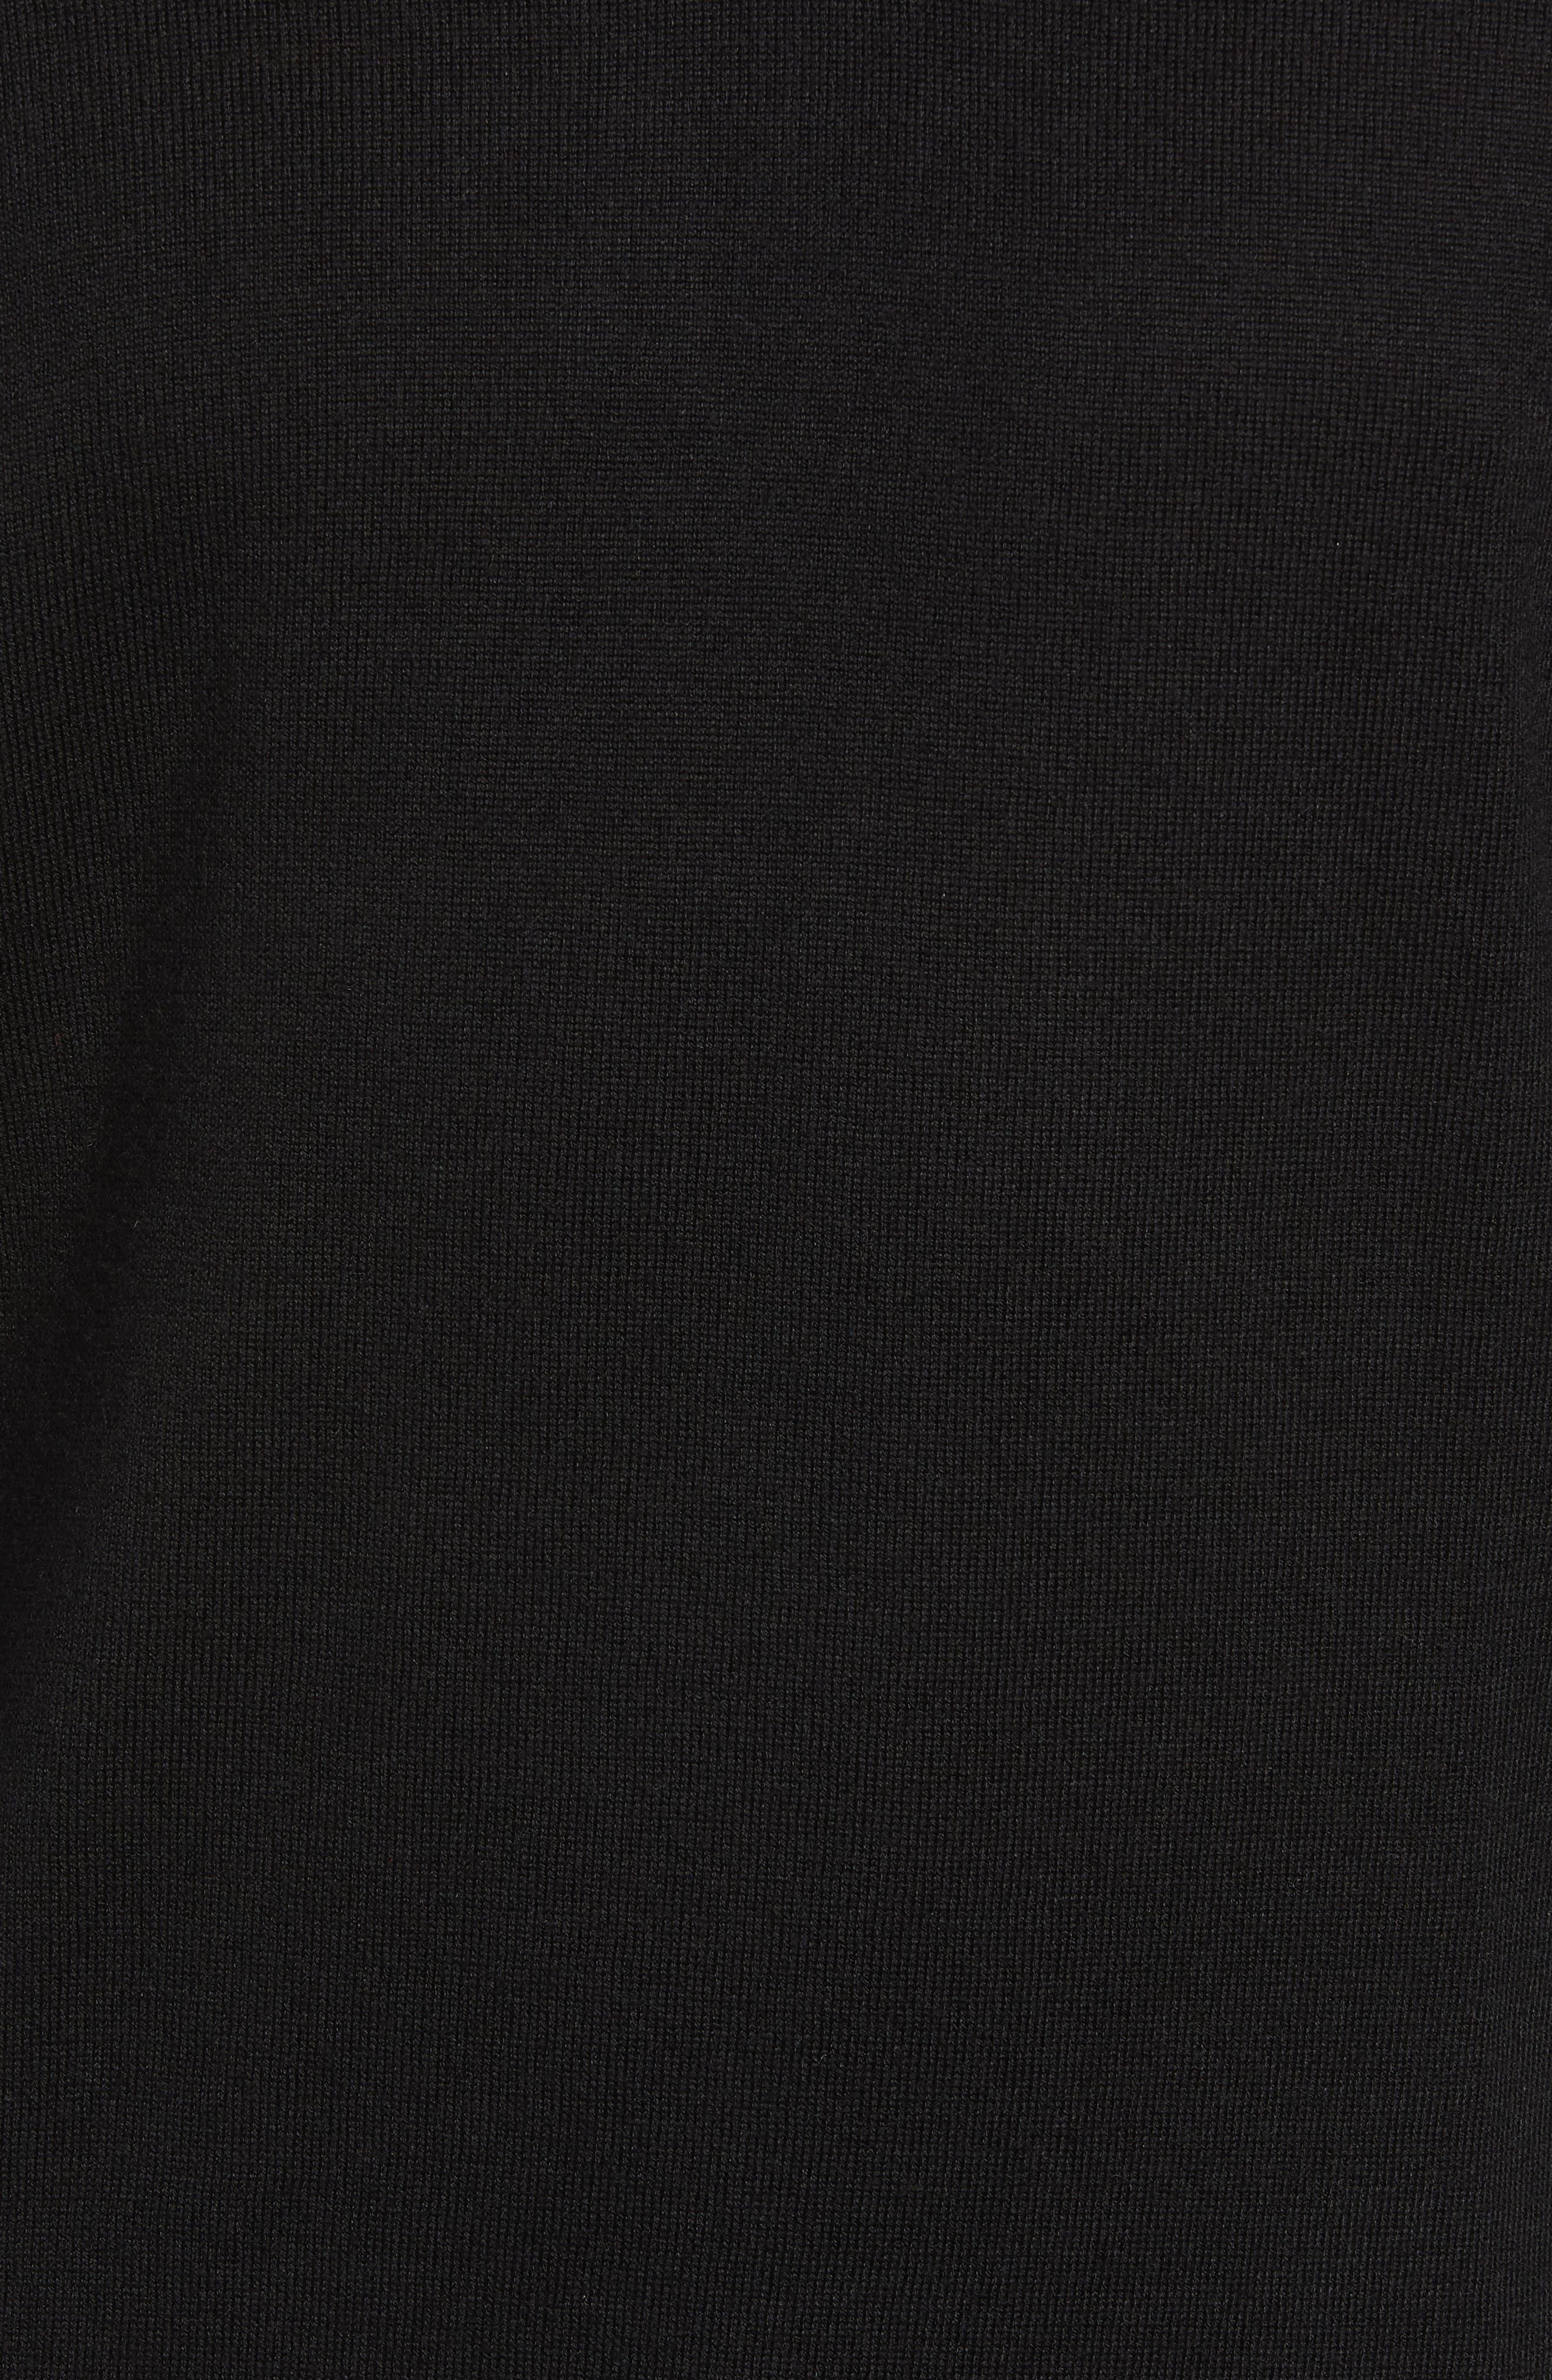 Wool & Silk V-Neck Sweater,                             Alternate thumbnail 5, color,                             001